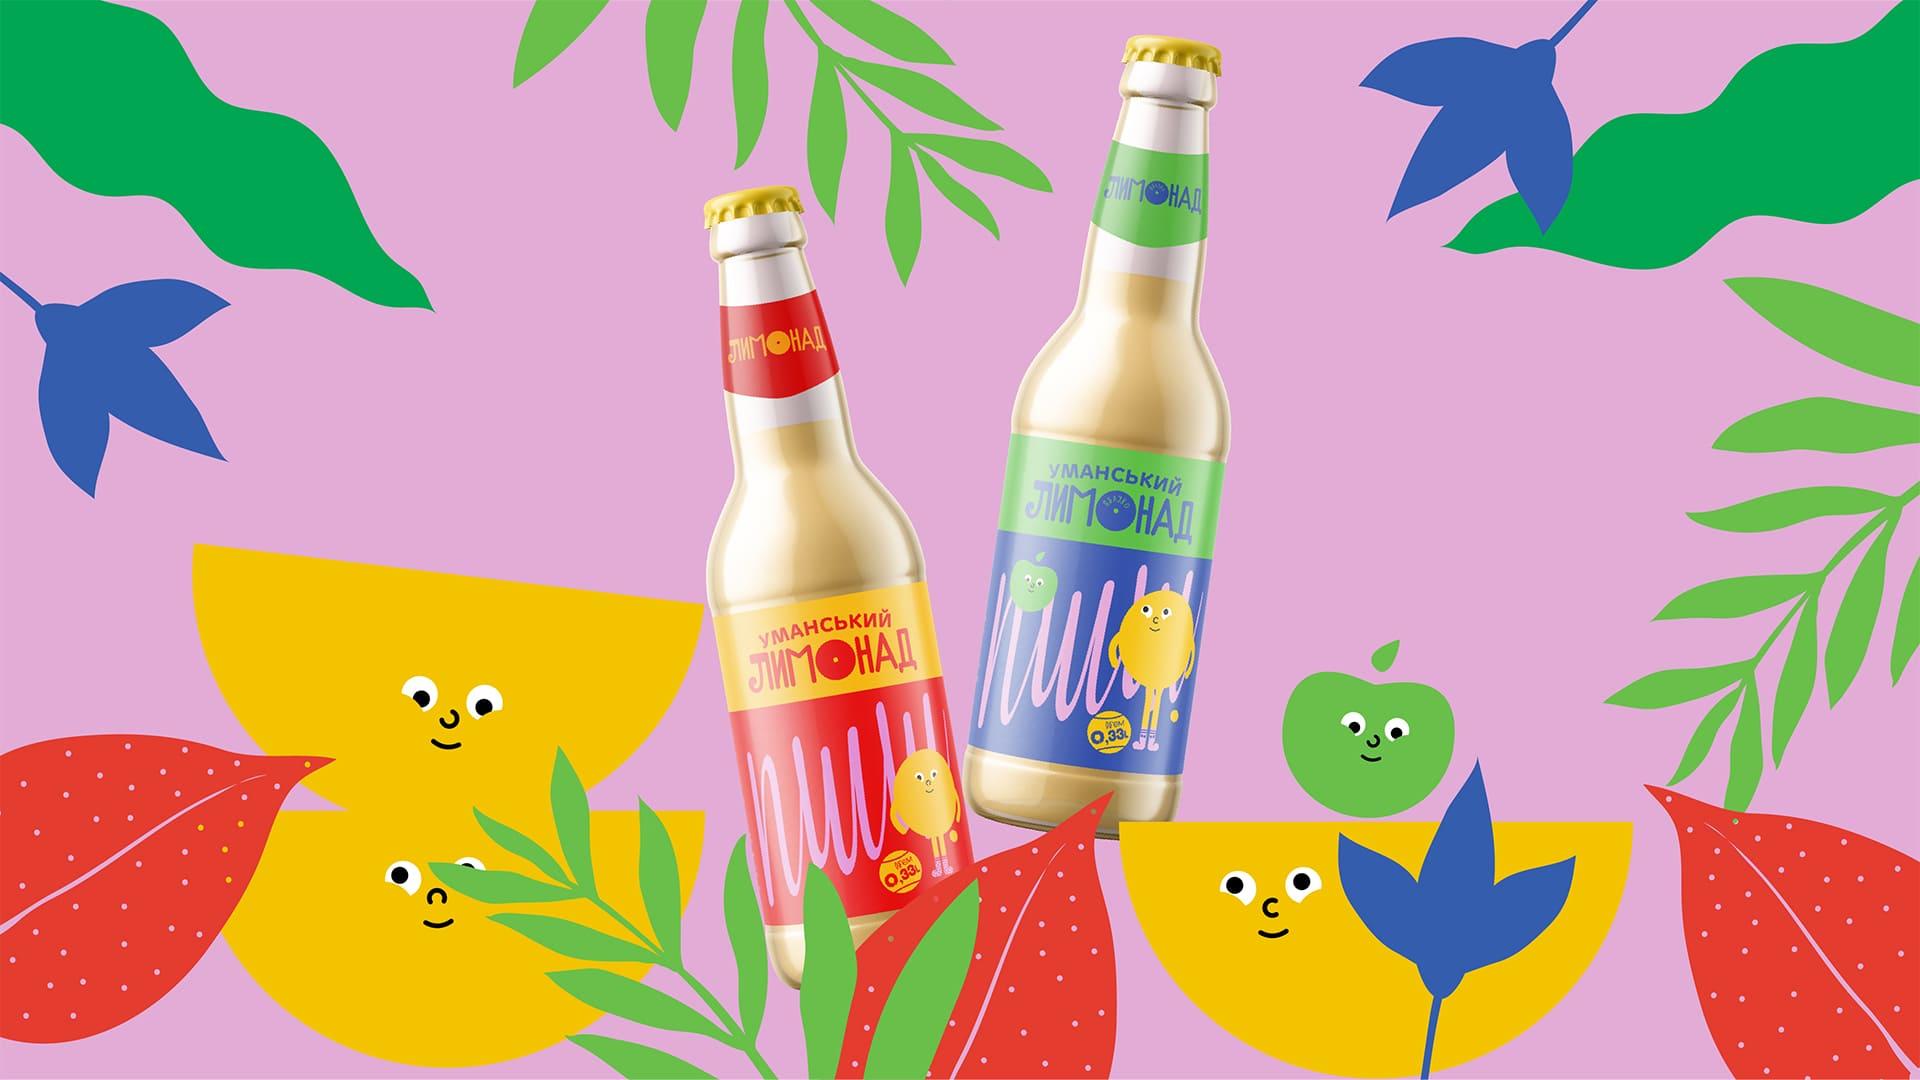 gra brand design umanpivo lemonade 9